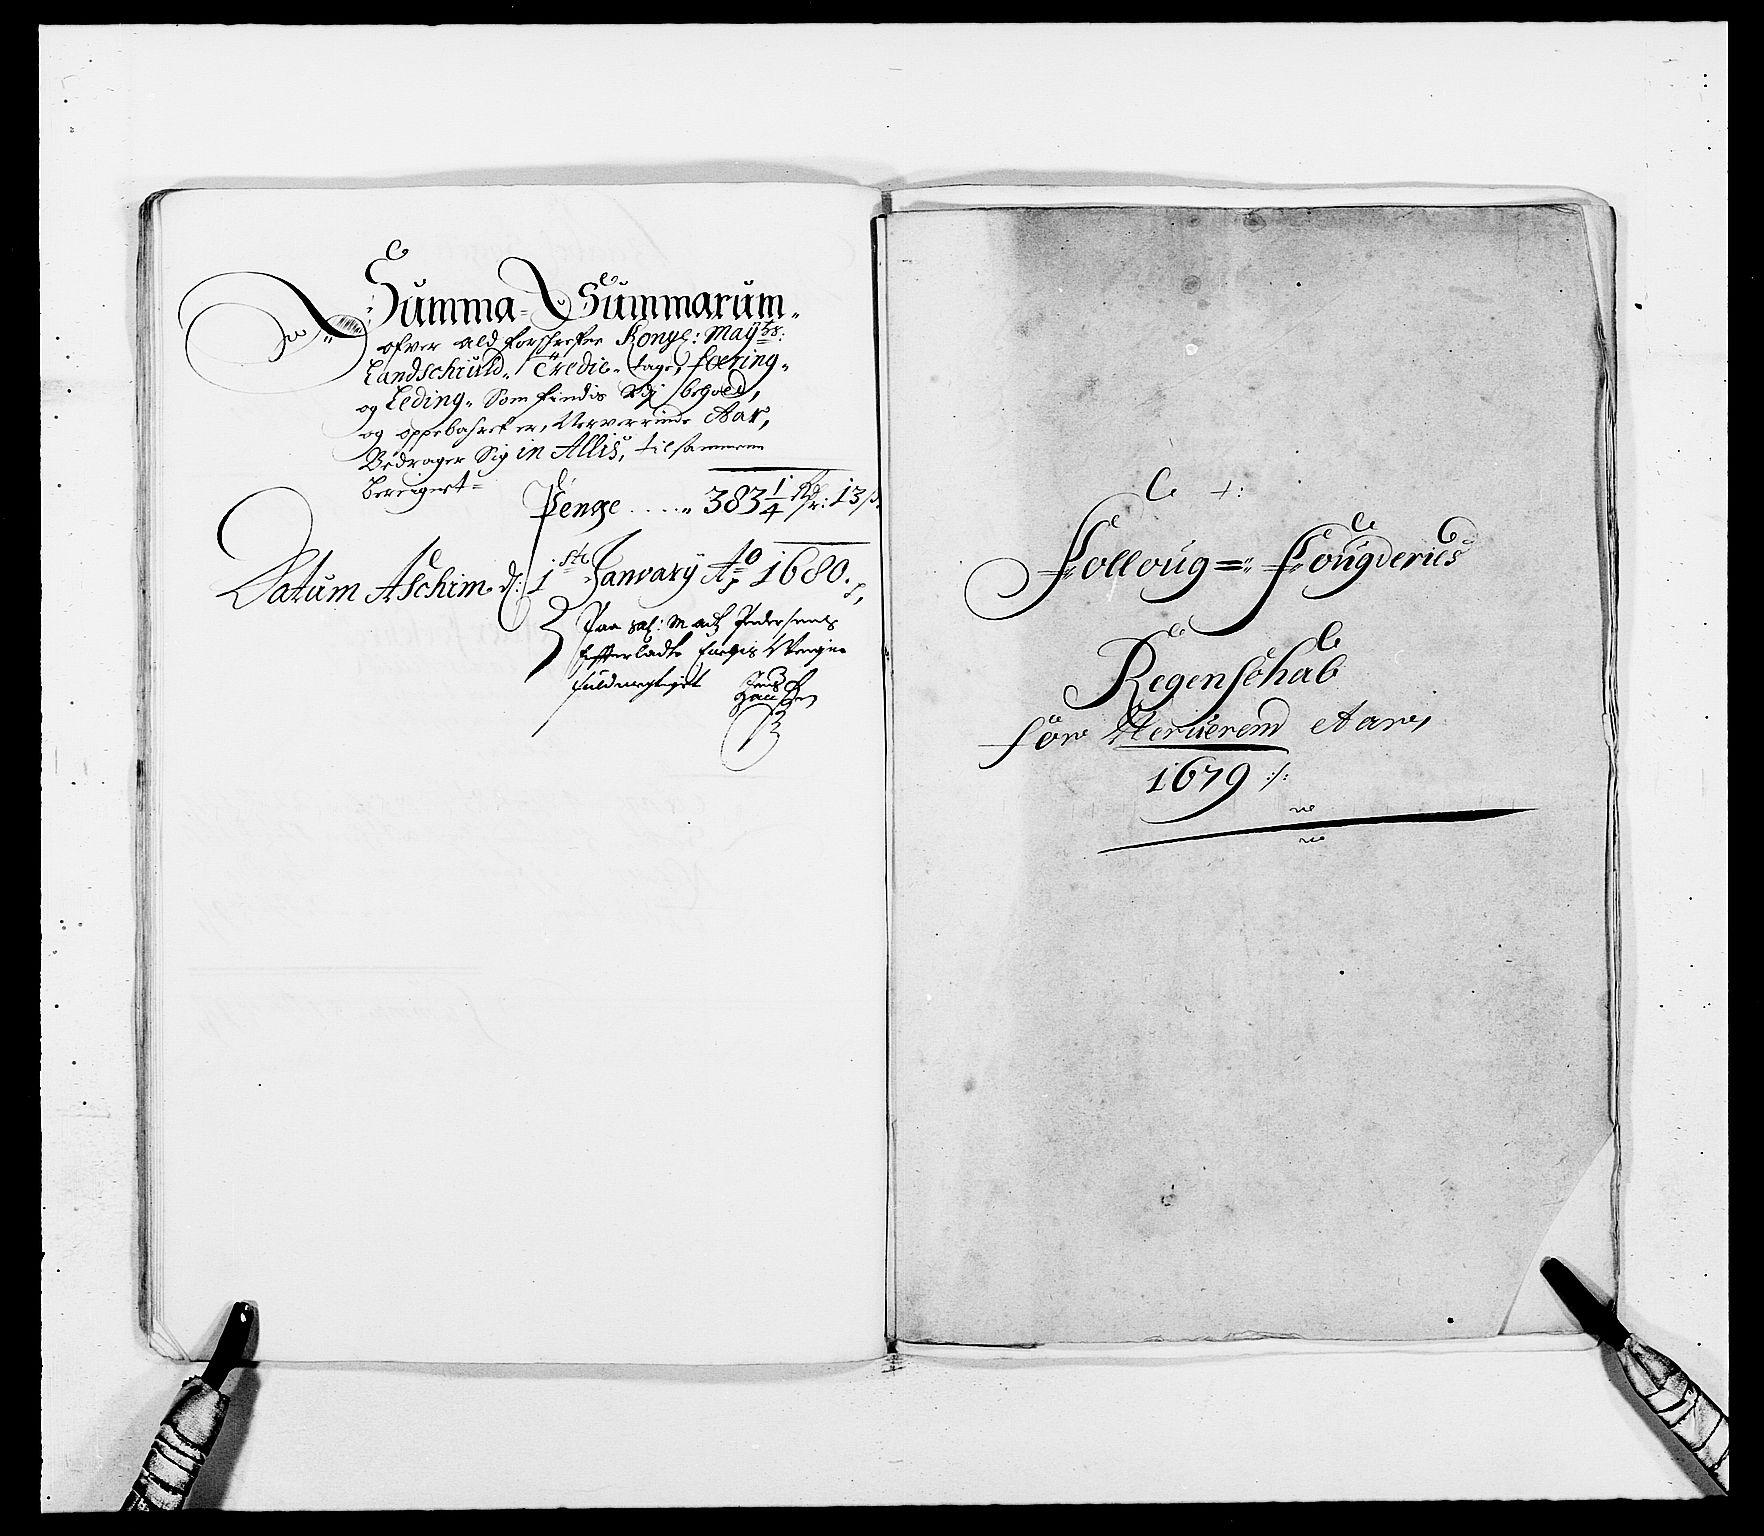 RA, Rentekammeret inntil 1814, Reviderte regnskaper, Fogderegnskap, R09/L0428: Fogderegnskap Follo, 1679, s. 35